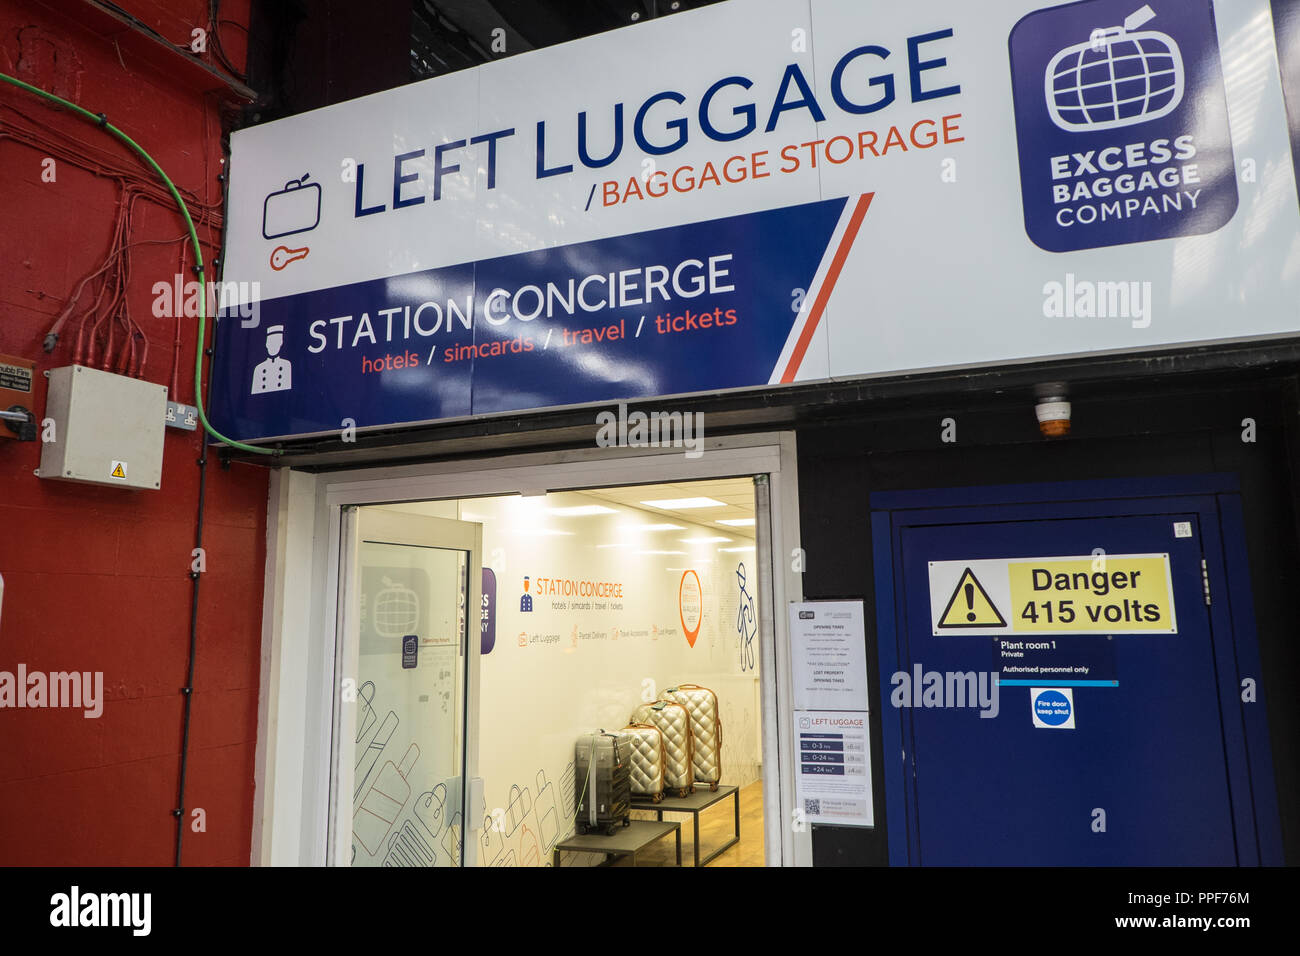 Left luggage,luggage,locker,company,storage,expensive